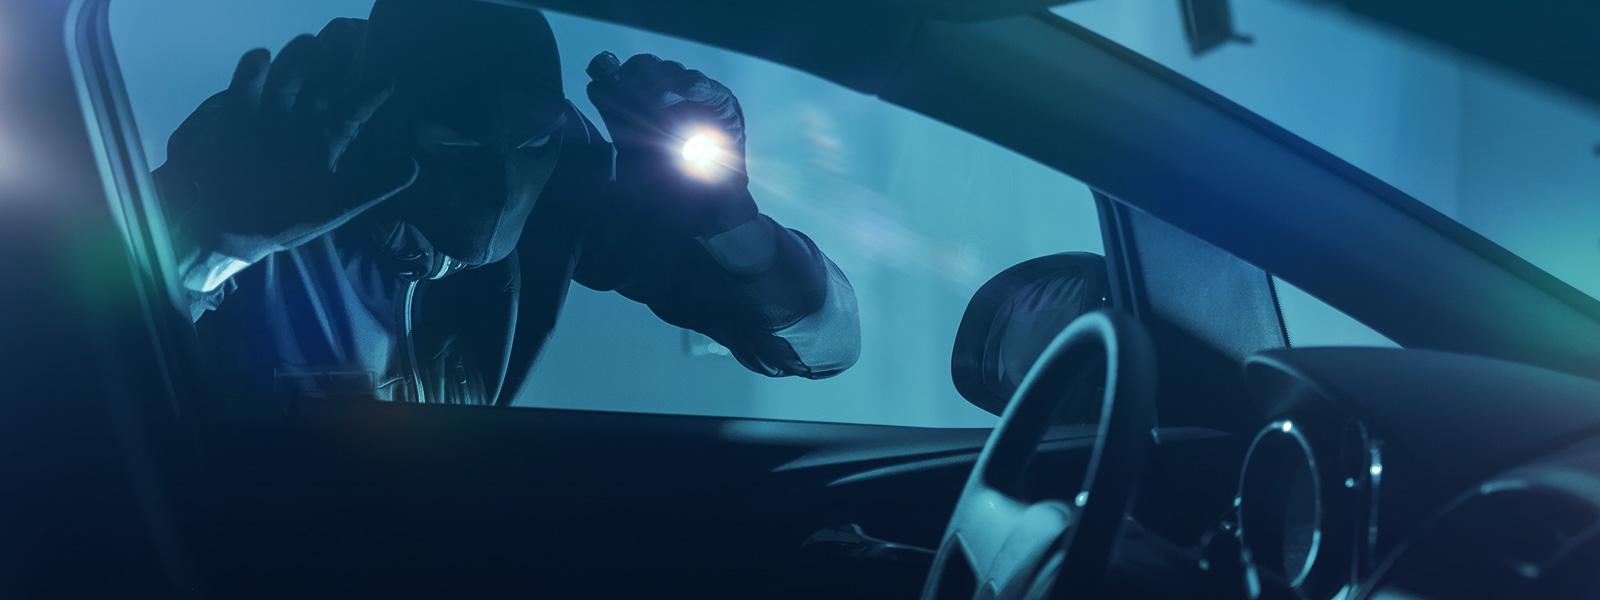 blog-ceabs-cinco-itens-inibem-acao-ladroes-carros